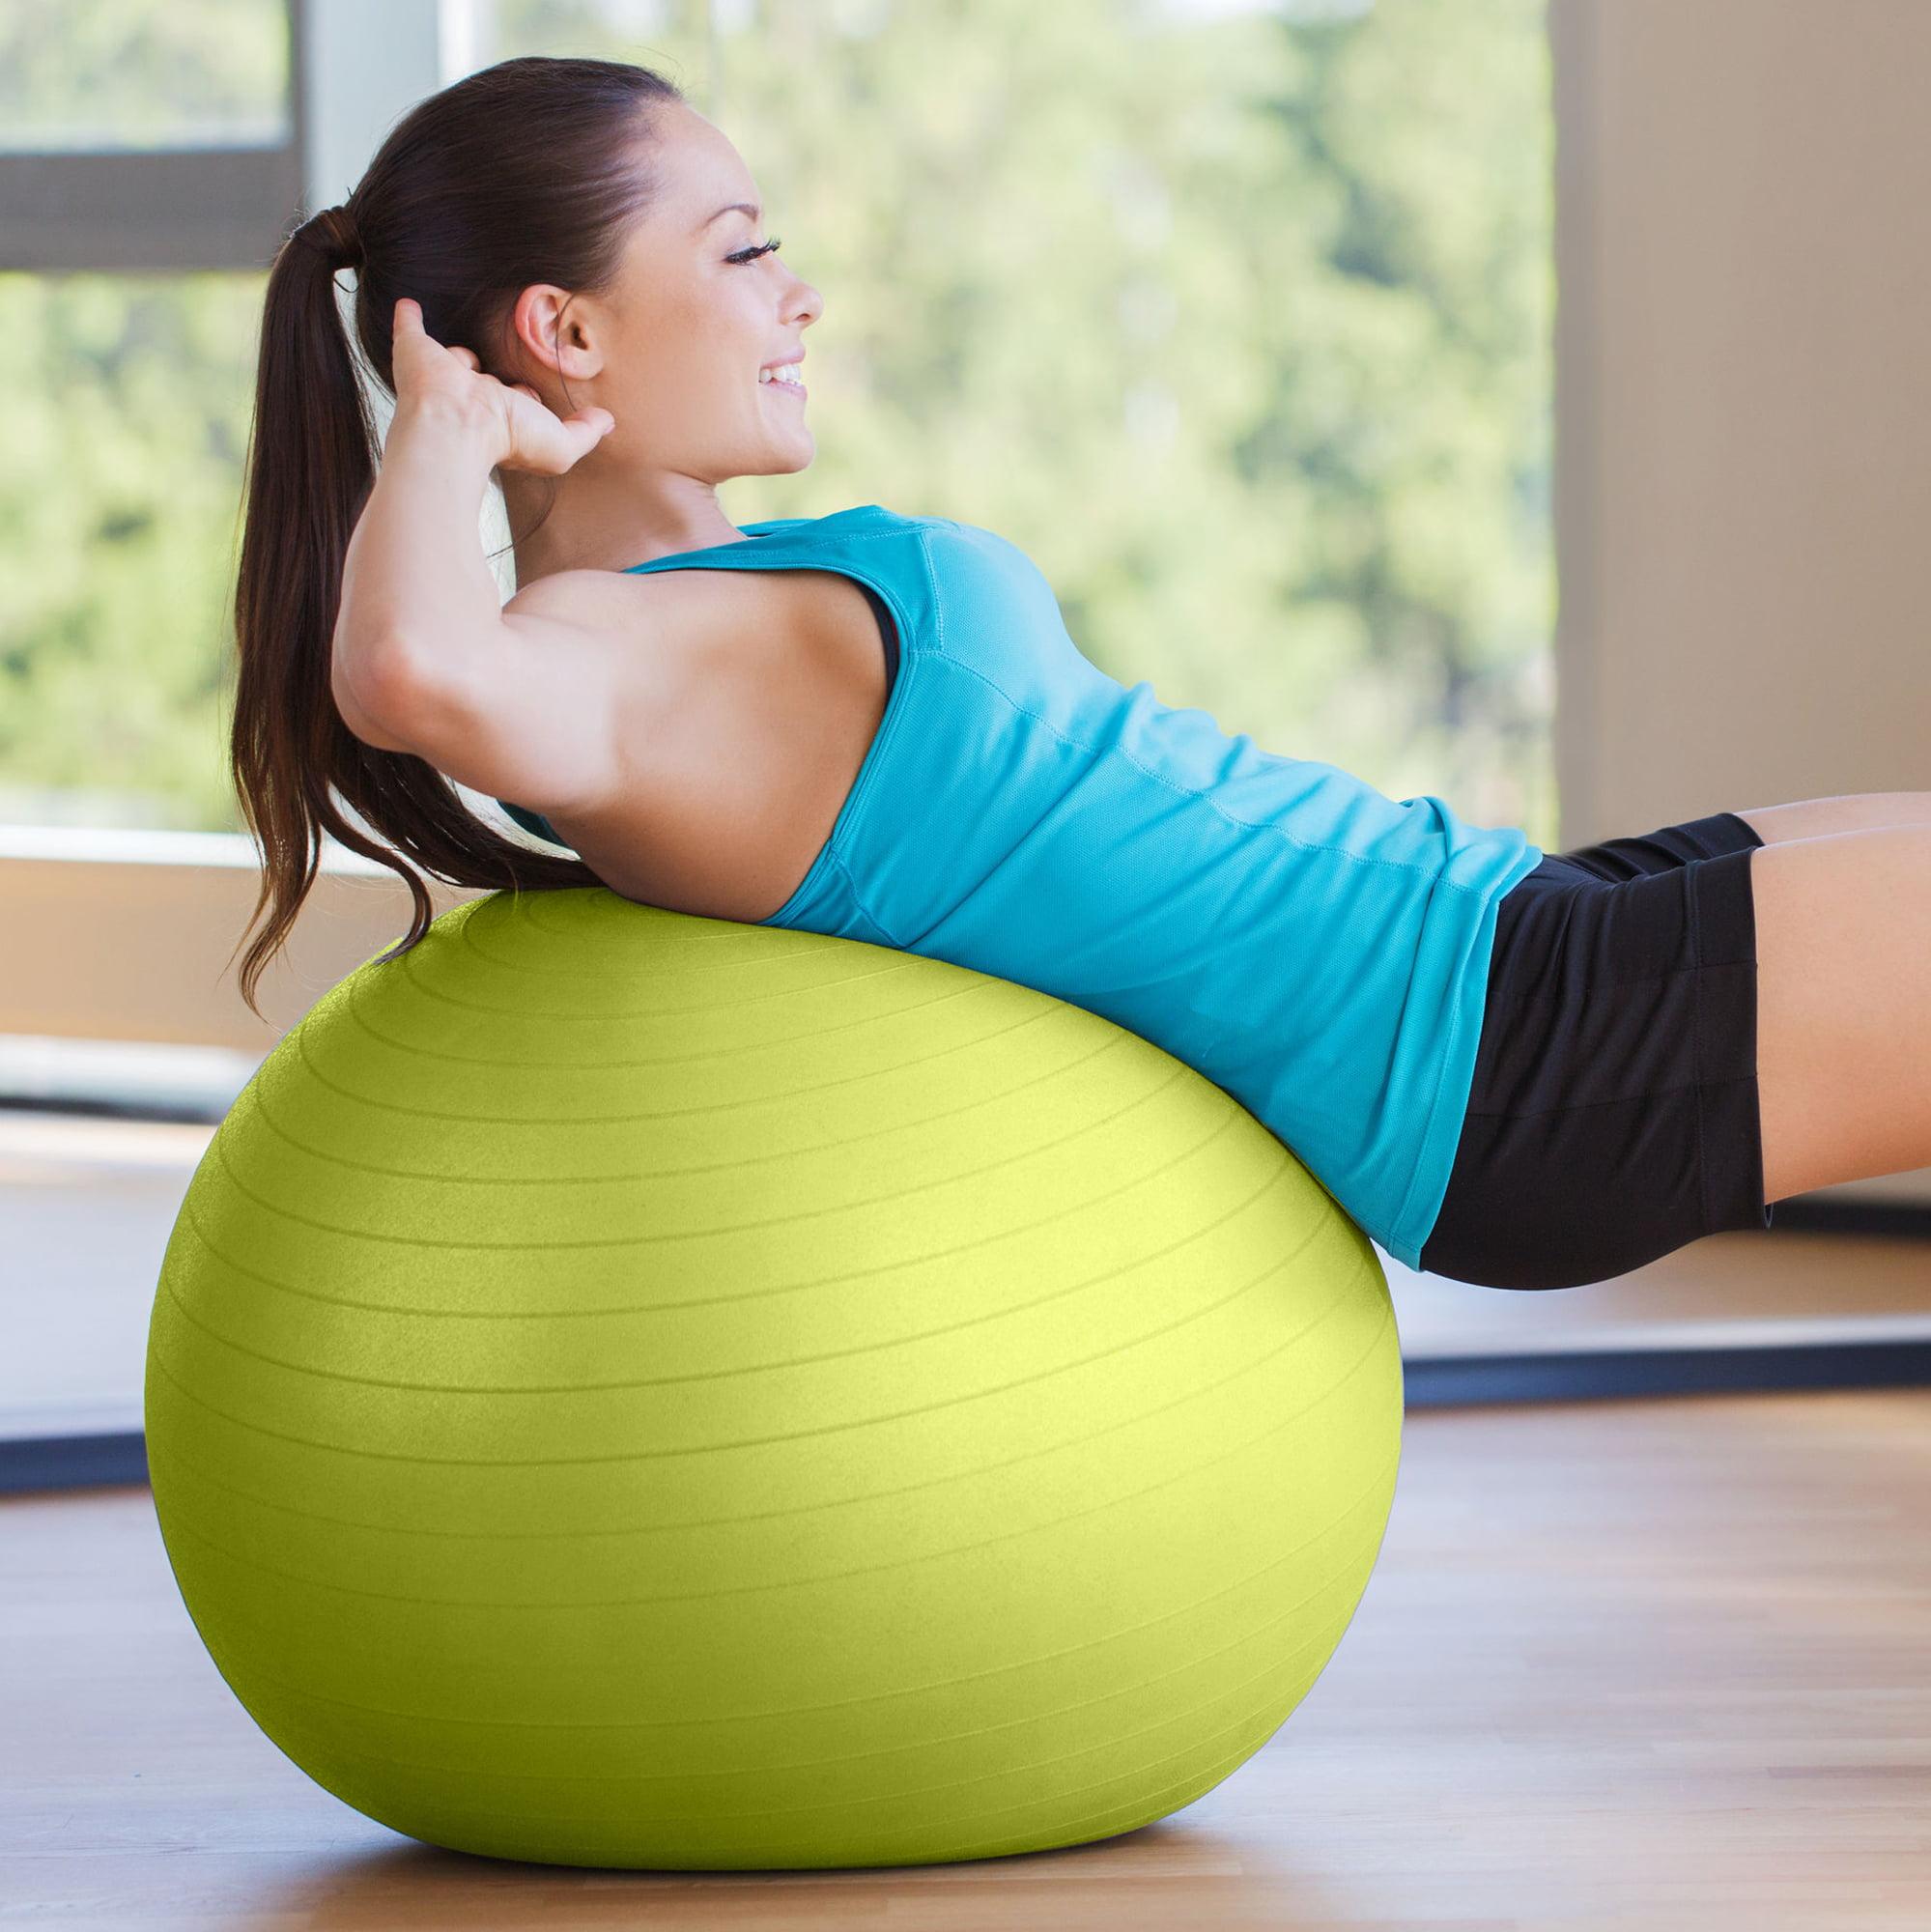 Gym Ball Bola Yoga Fitnes Senam Free Pompa 65cm Jim Daftar Size65cm Fitness Bonus Angin Fitball Pure Professional Exercise Stability